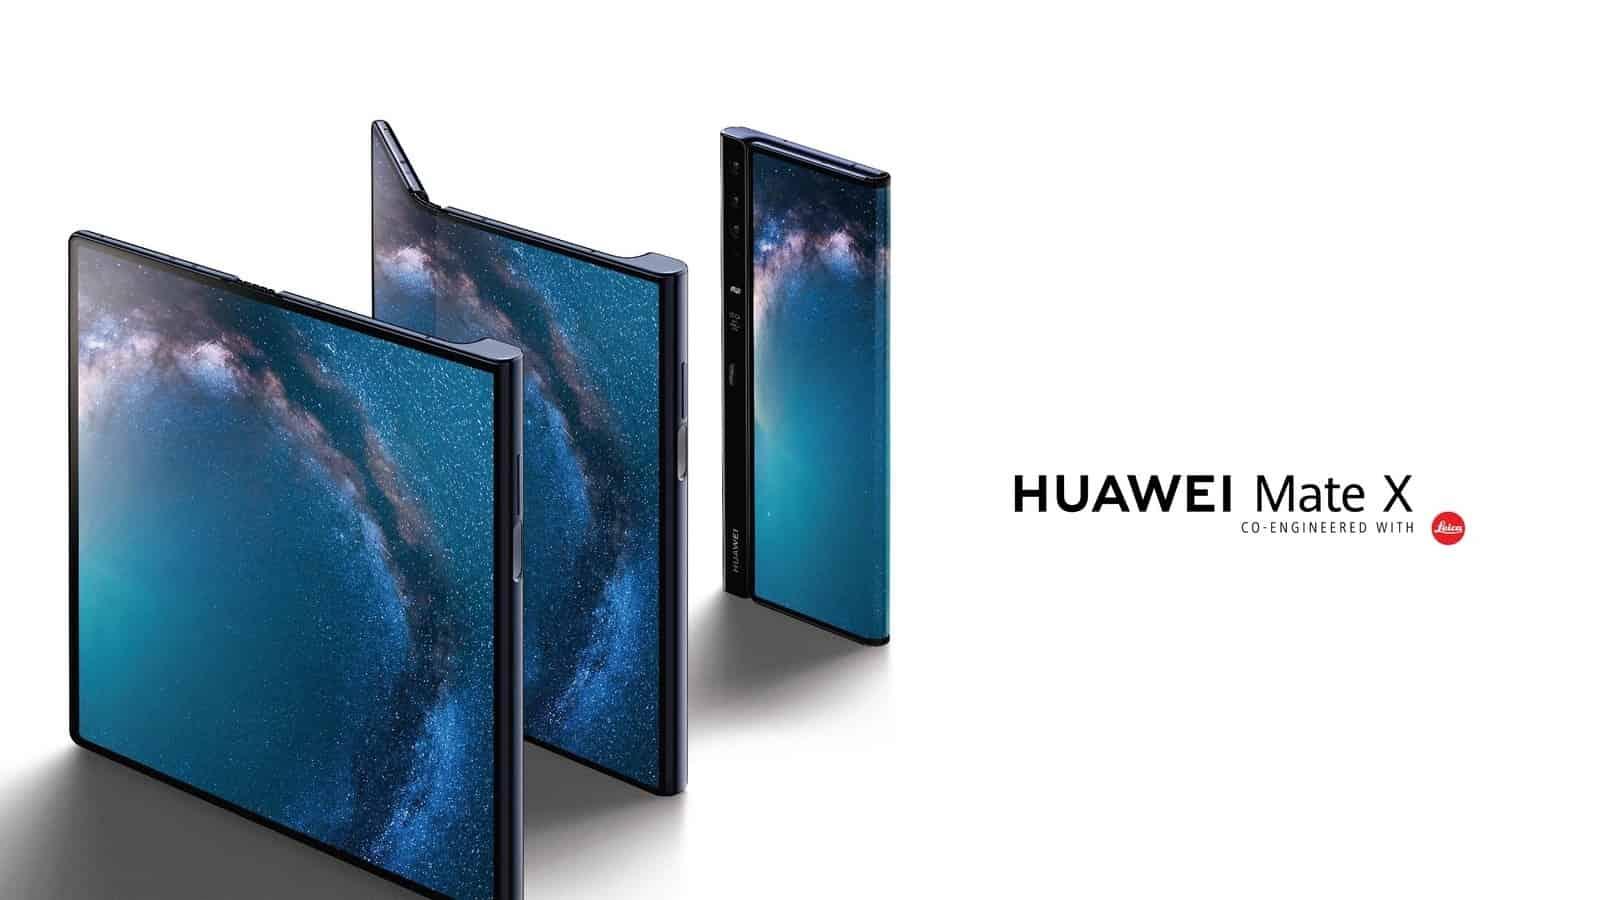 Huawei Mate X image 111